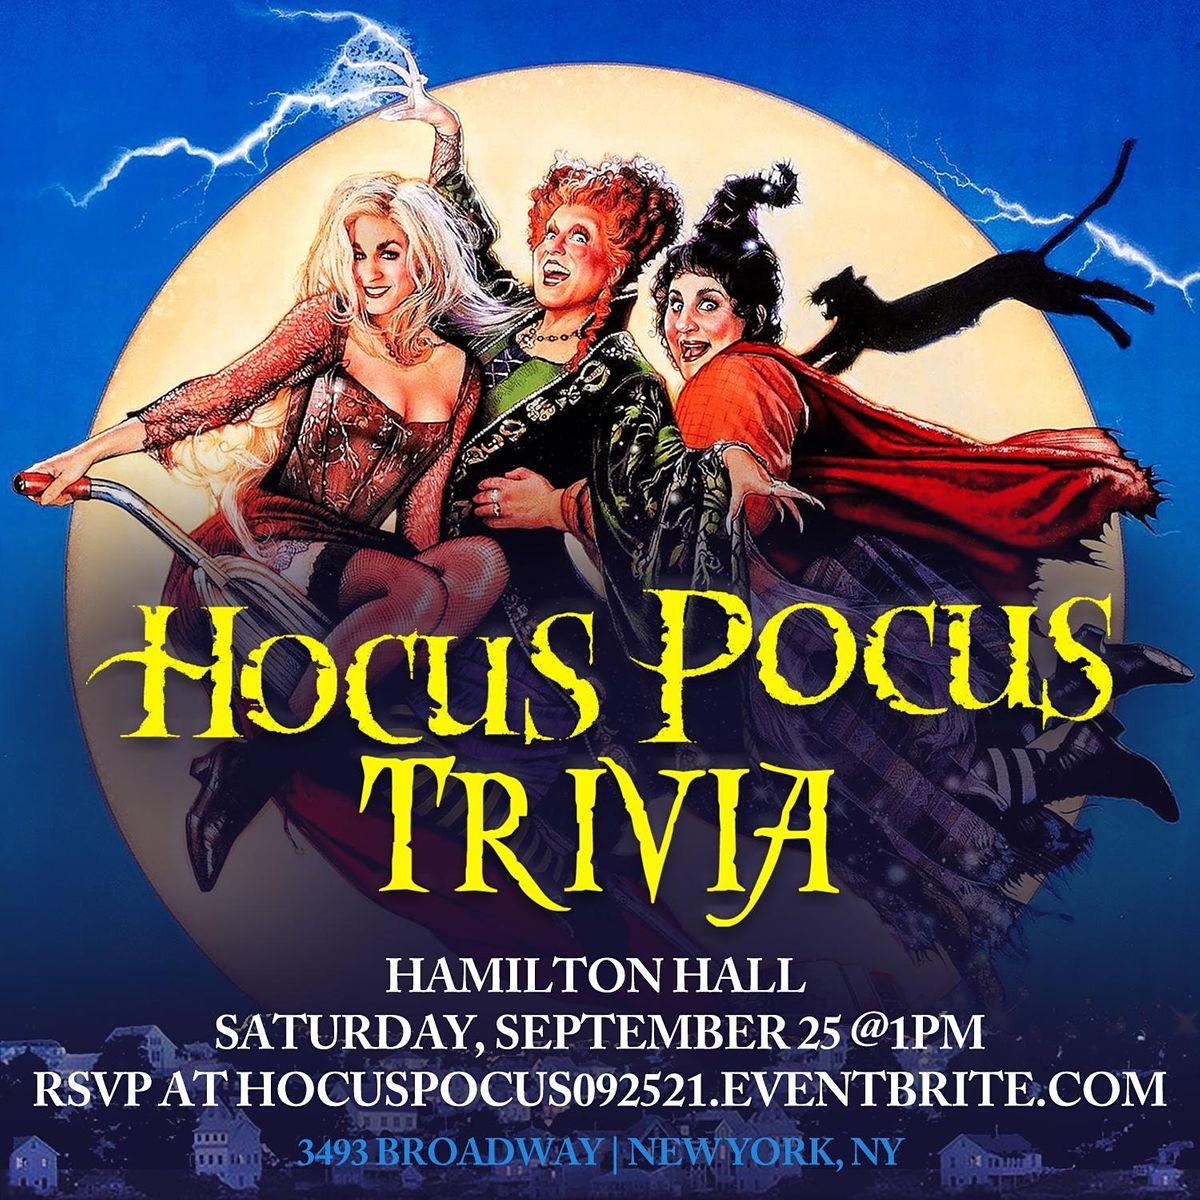 Hocus Pocus Trivia, 25 September   Event in New York   AllEvents.in